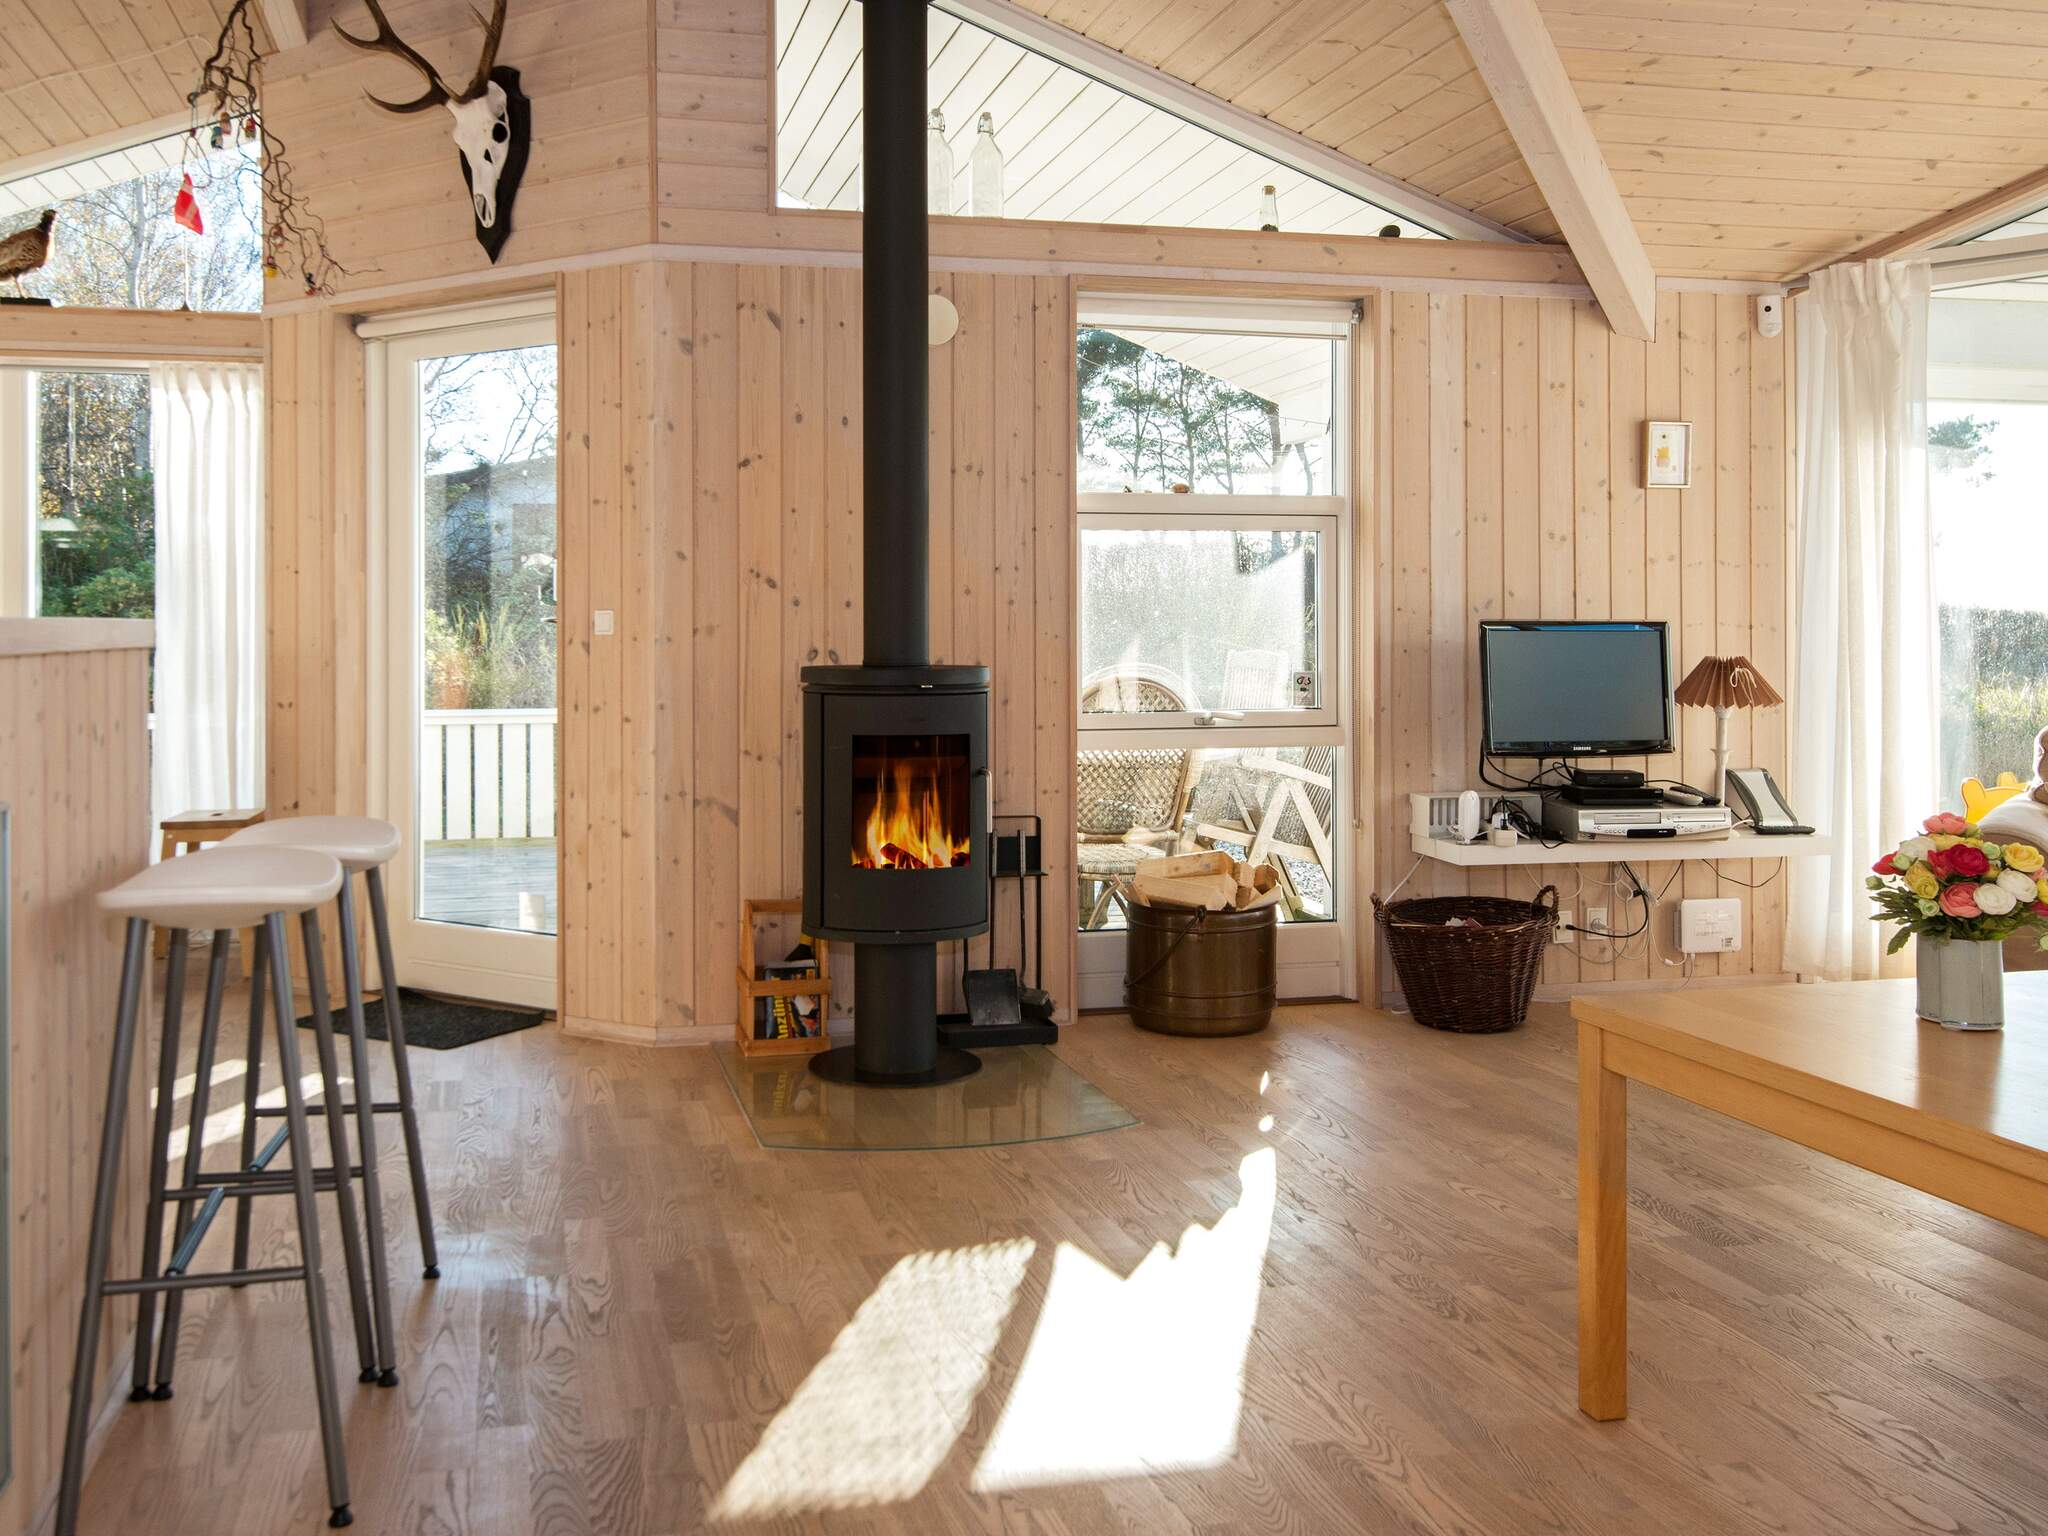 Maison de vacances Helgenæs (681779), Knebel, , Mer Baltique danoise, Danemark, image 5